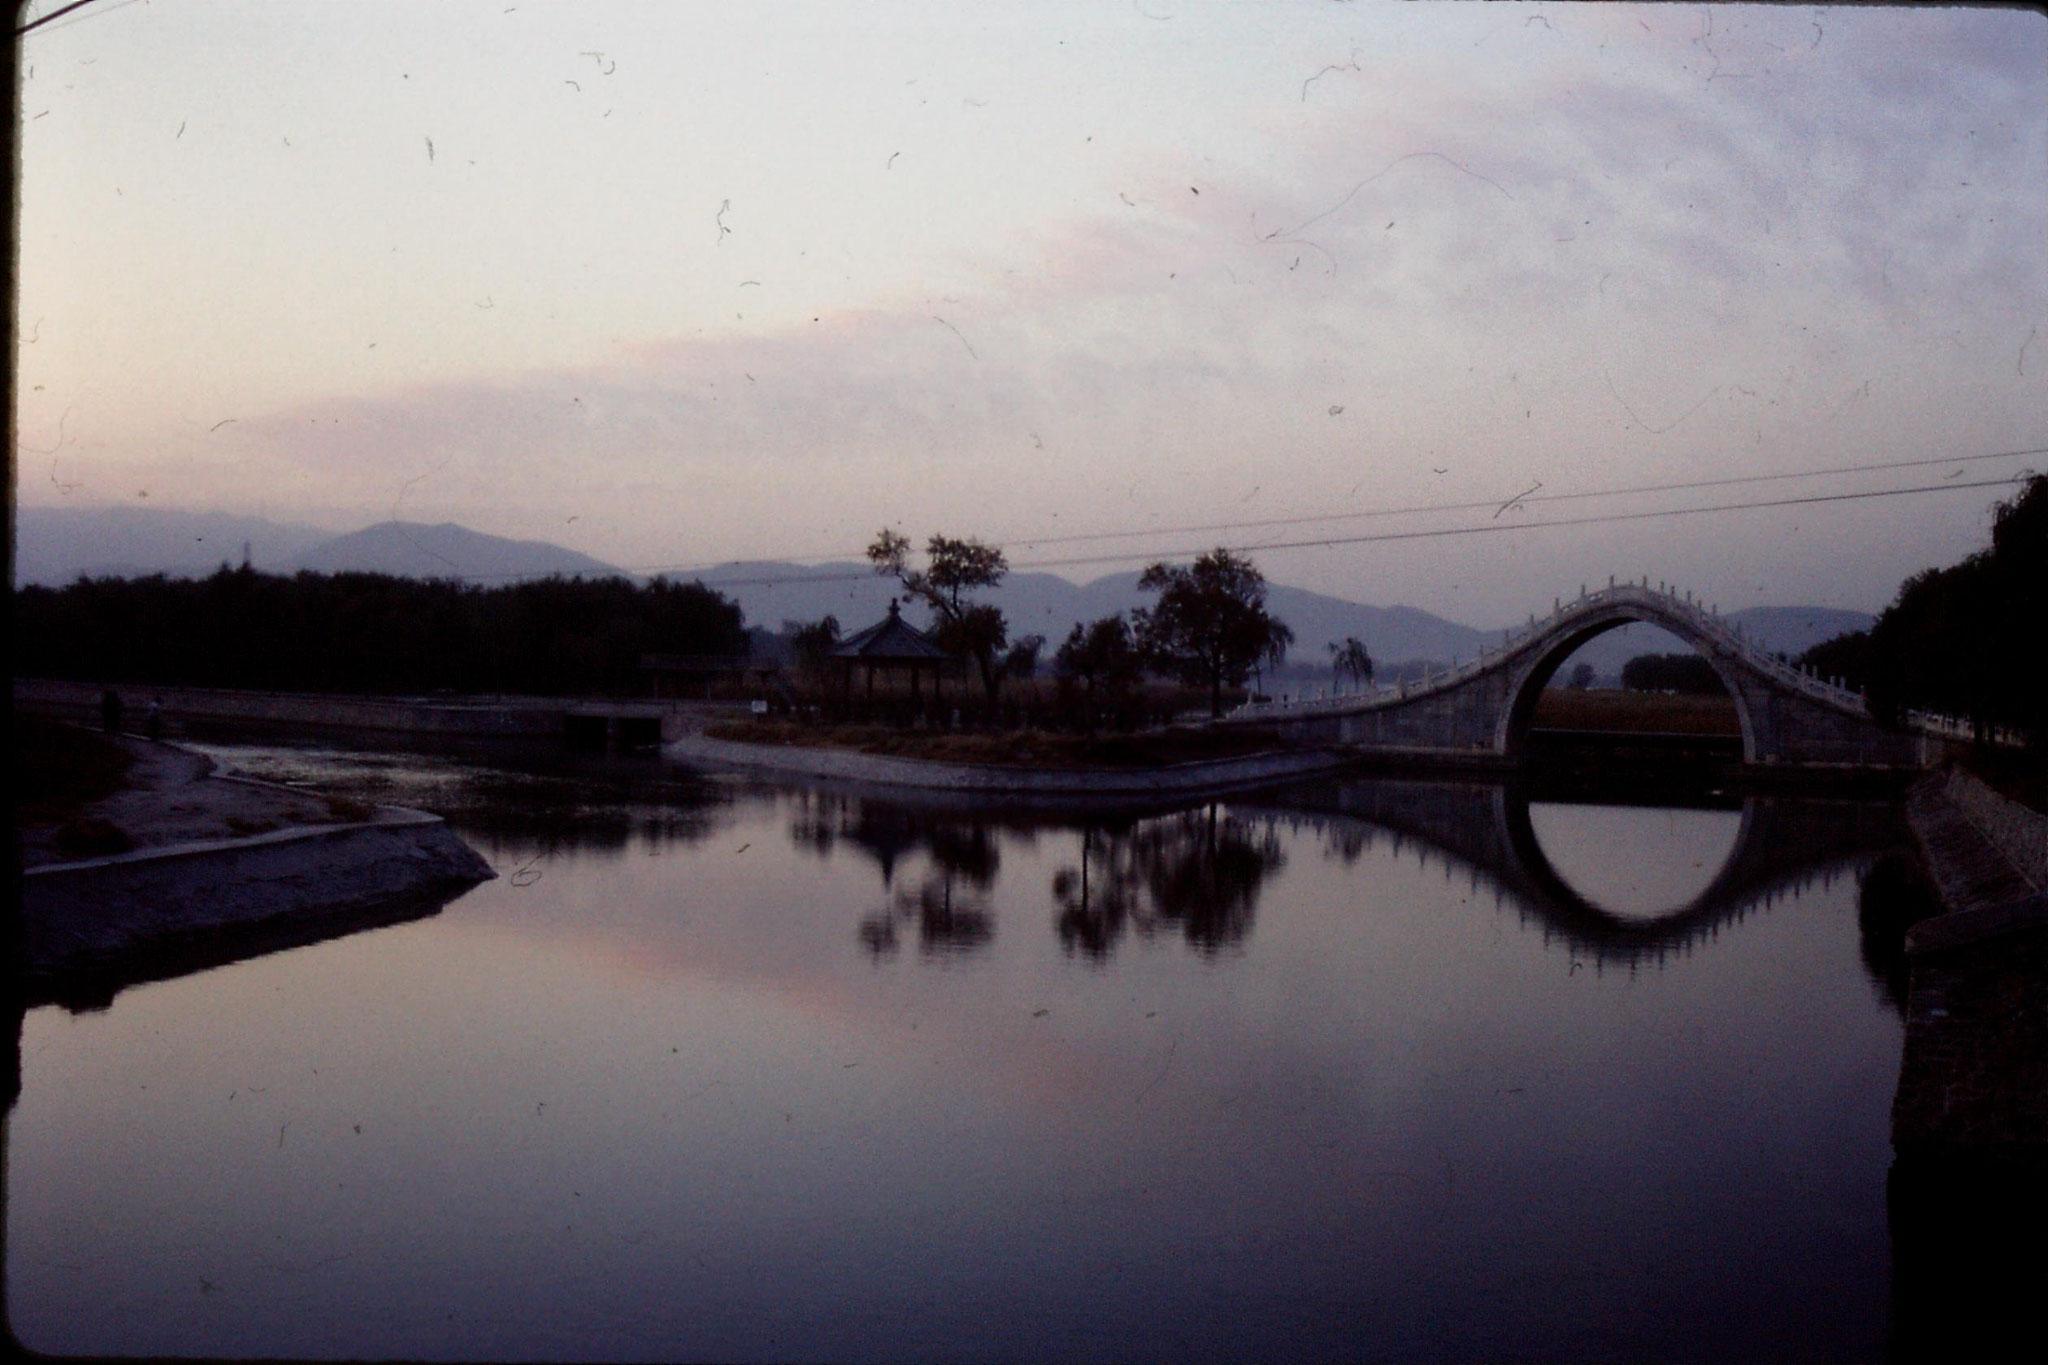 3/11/1988: 19: Summer Palace park